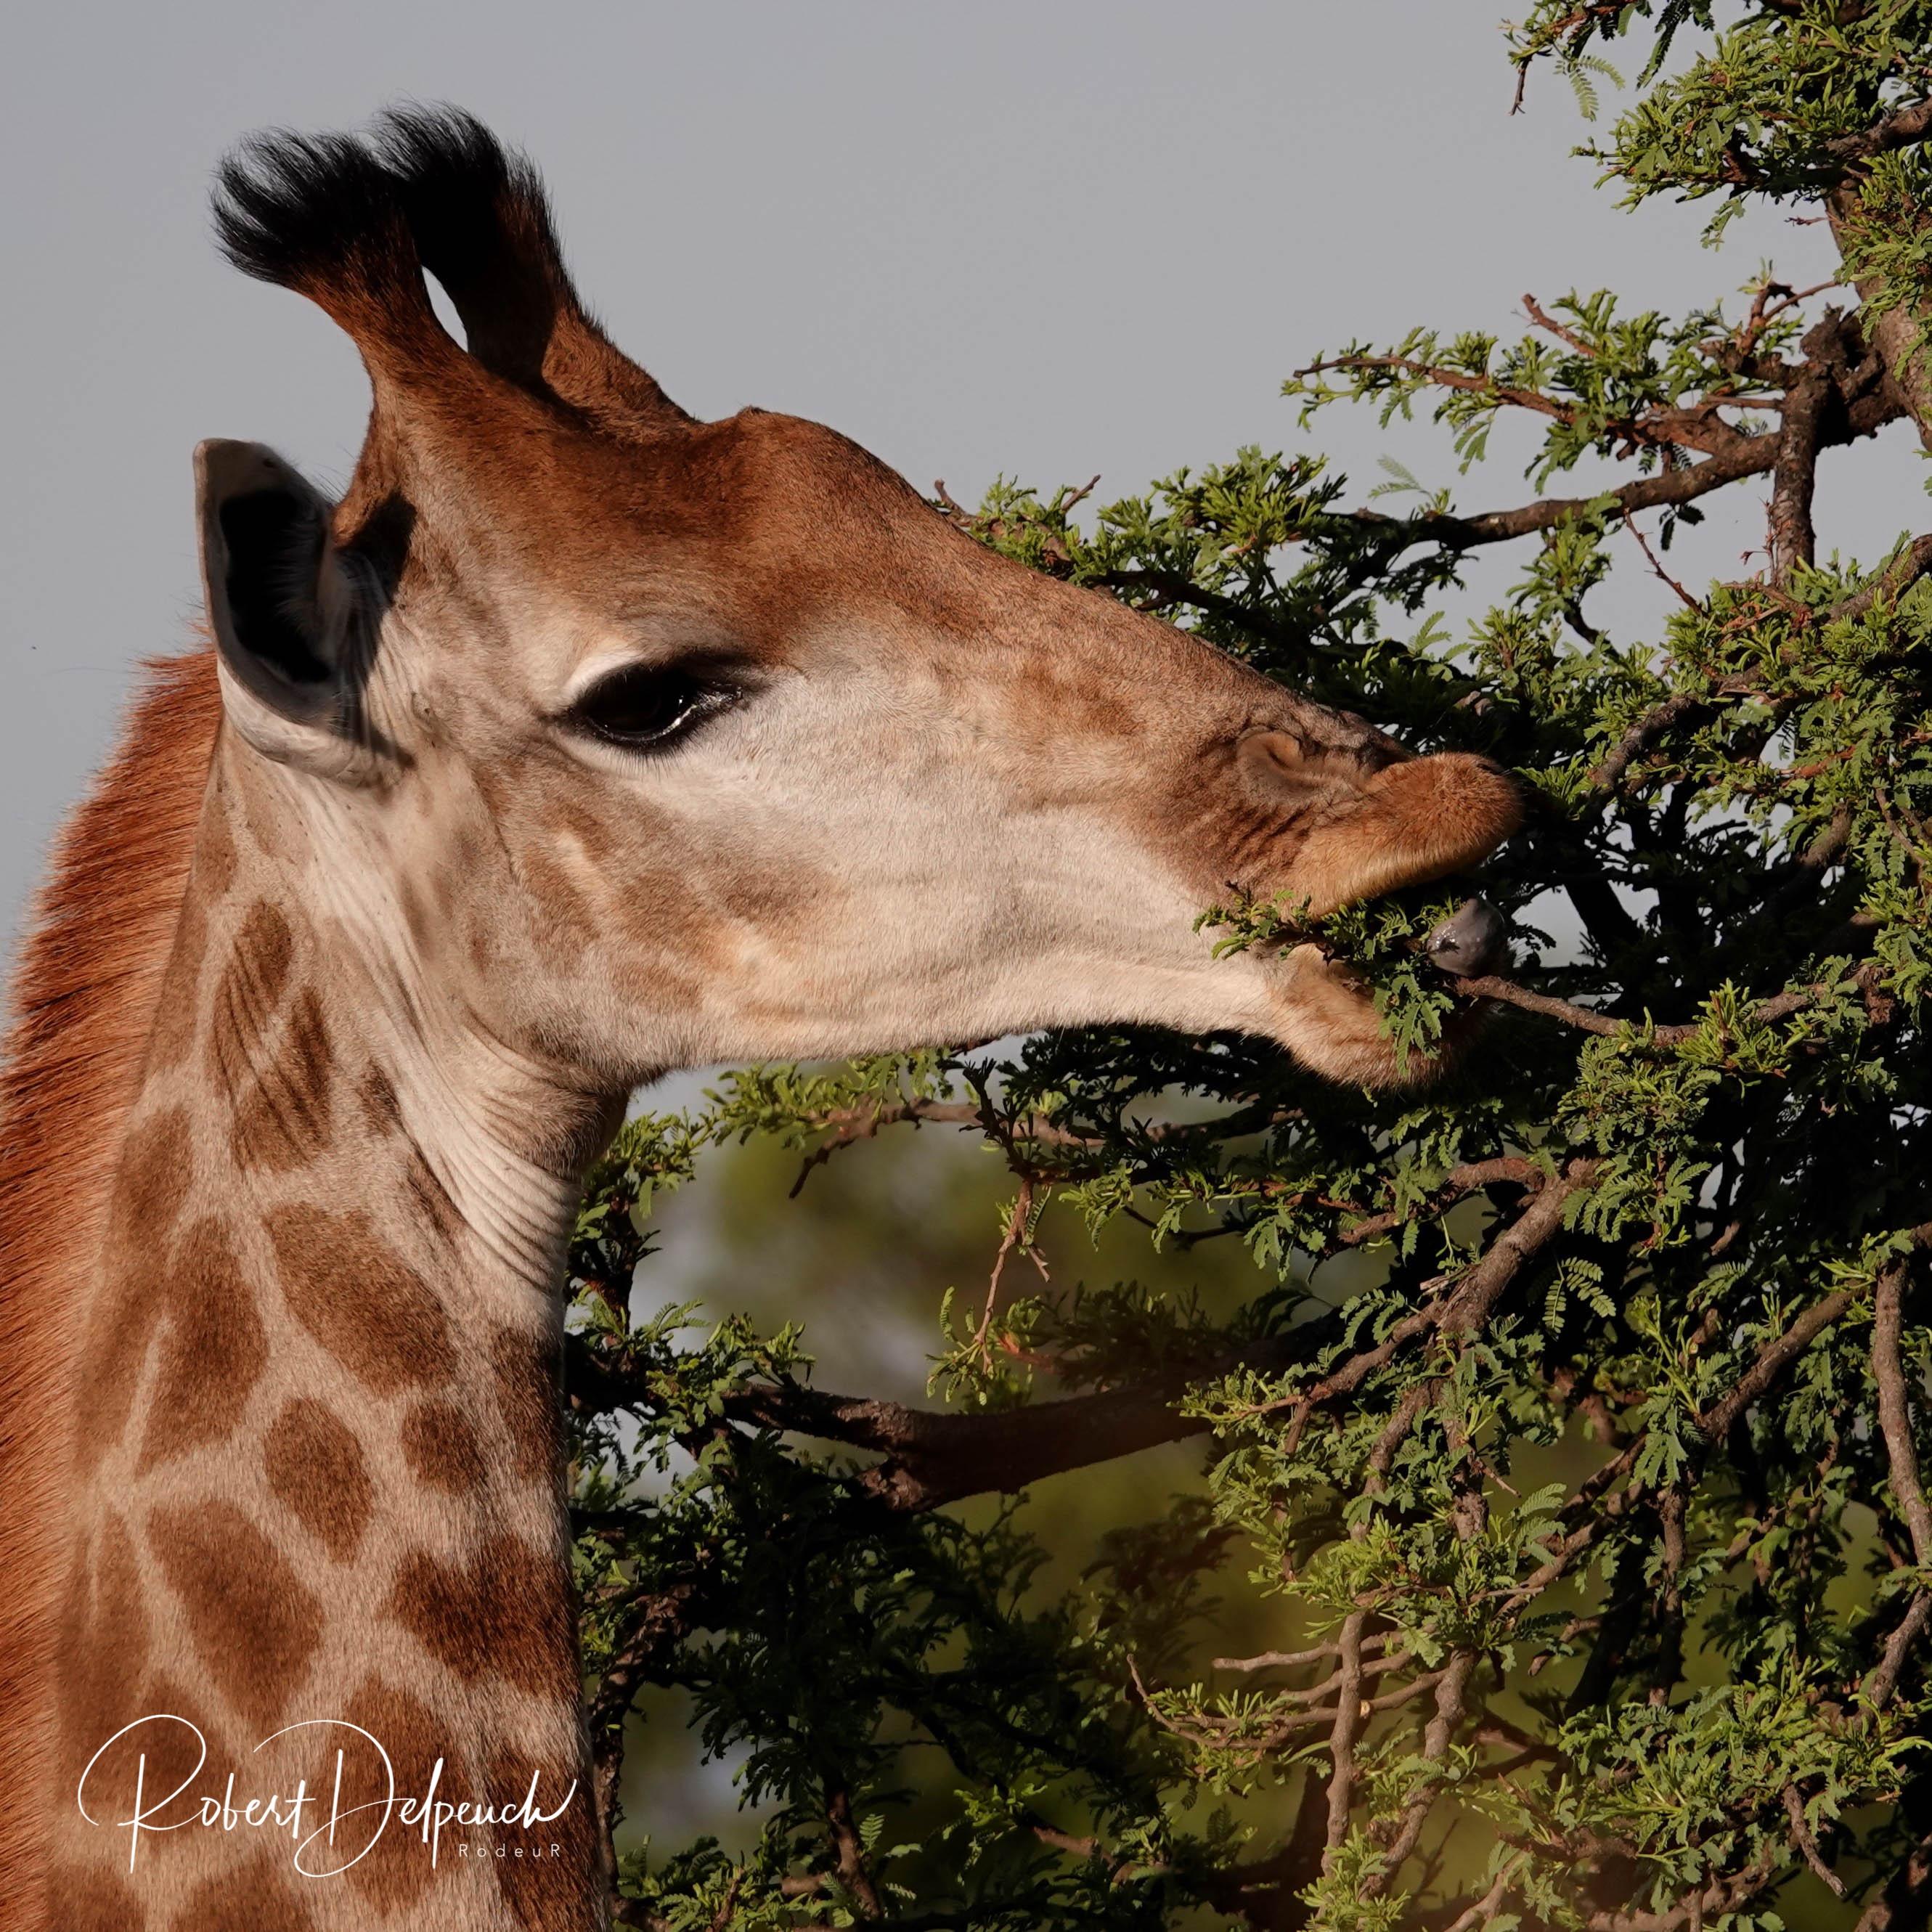 Girafe angolensis